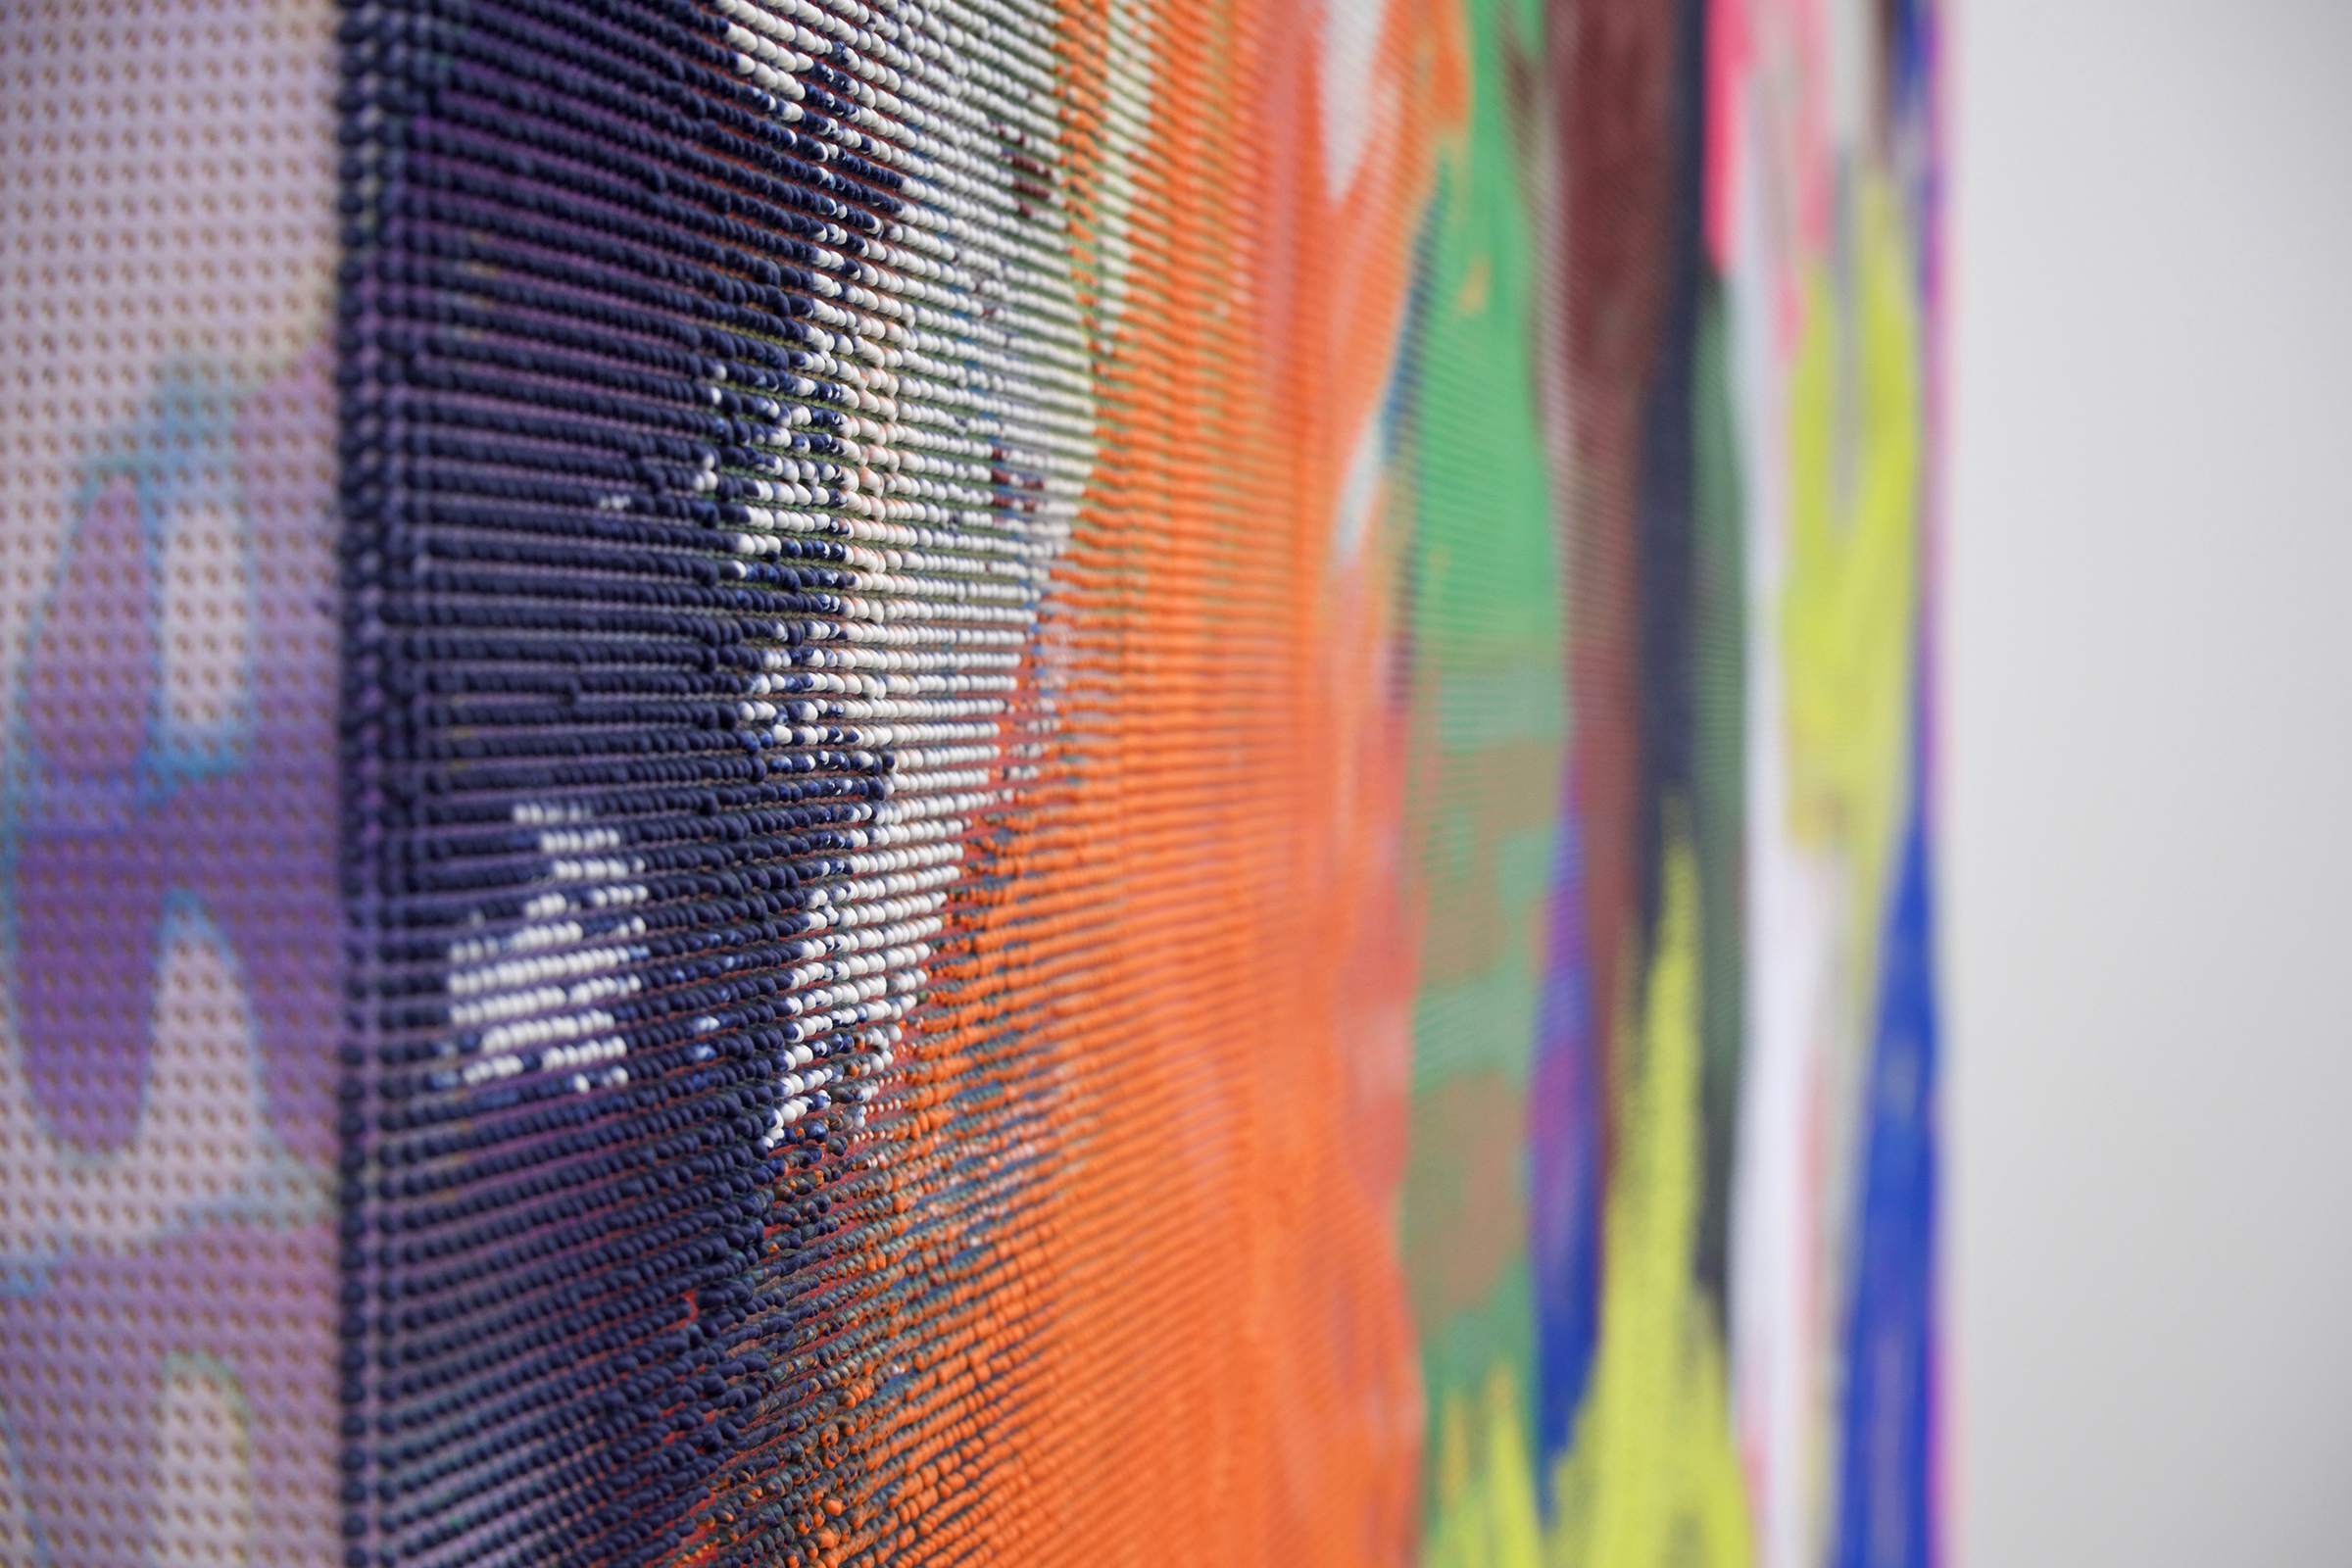 "EVAN NESBIT (detail) Manifold Painting (Ever Dissonant Futures) , 2017, acrylic, UV curable ink on vinyl coated mesh fabric, 66"" x 60"""